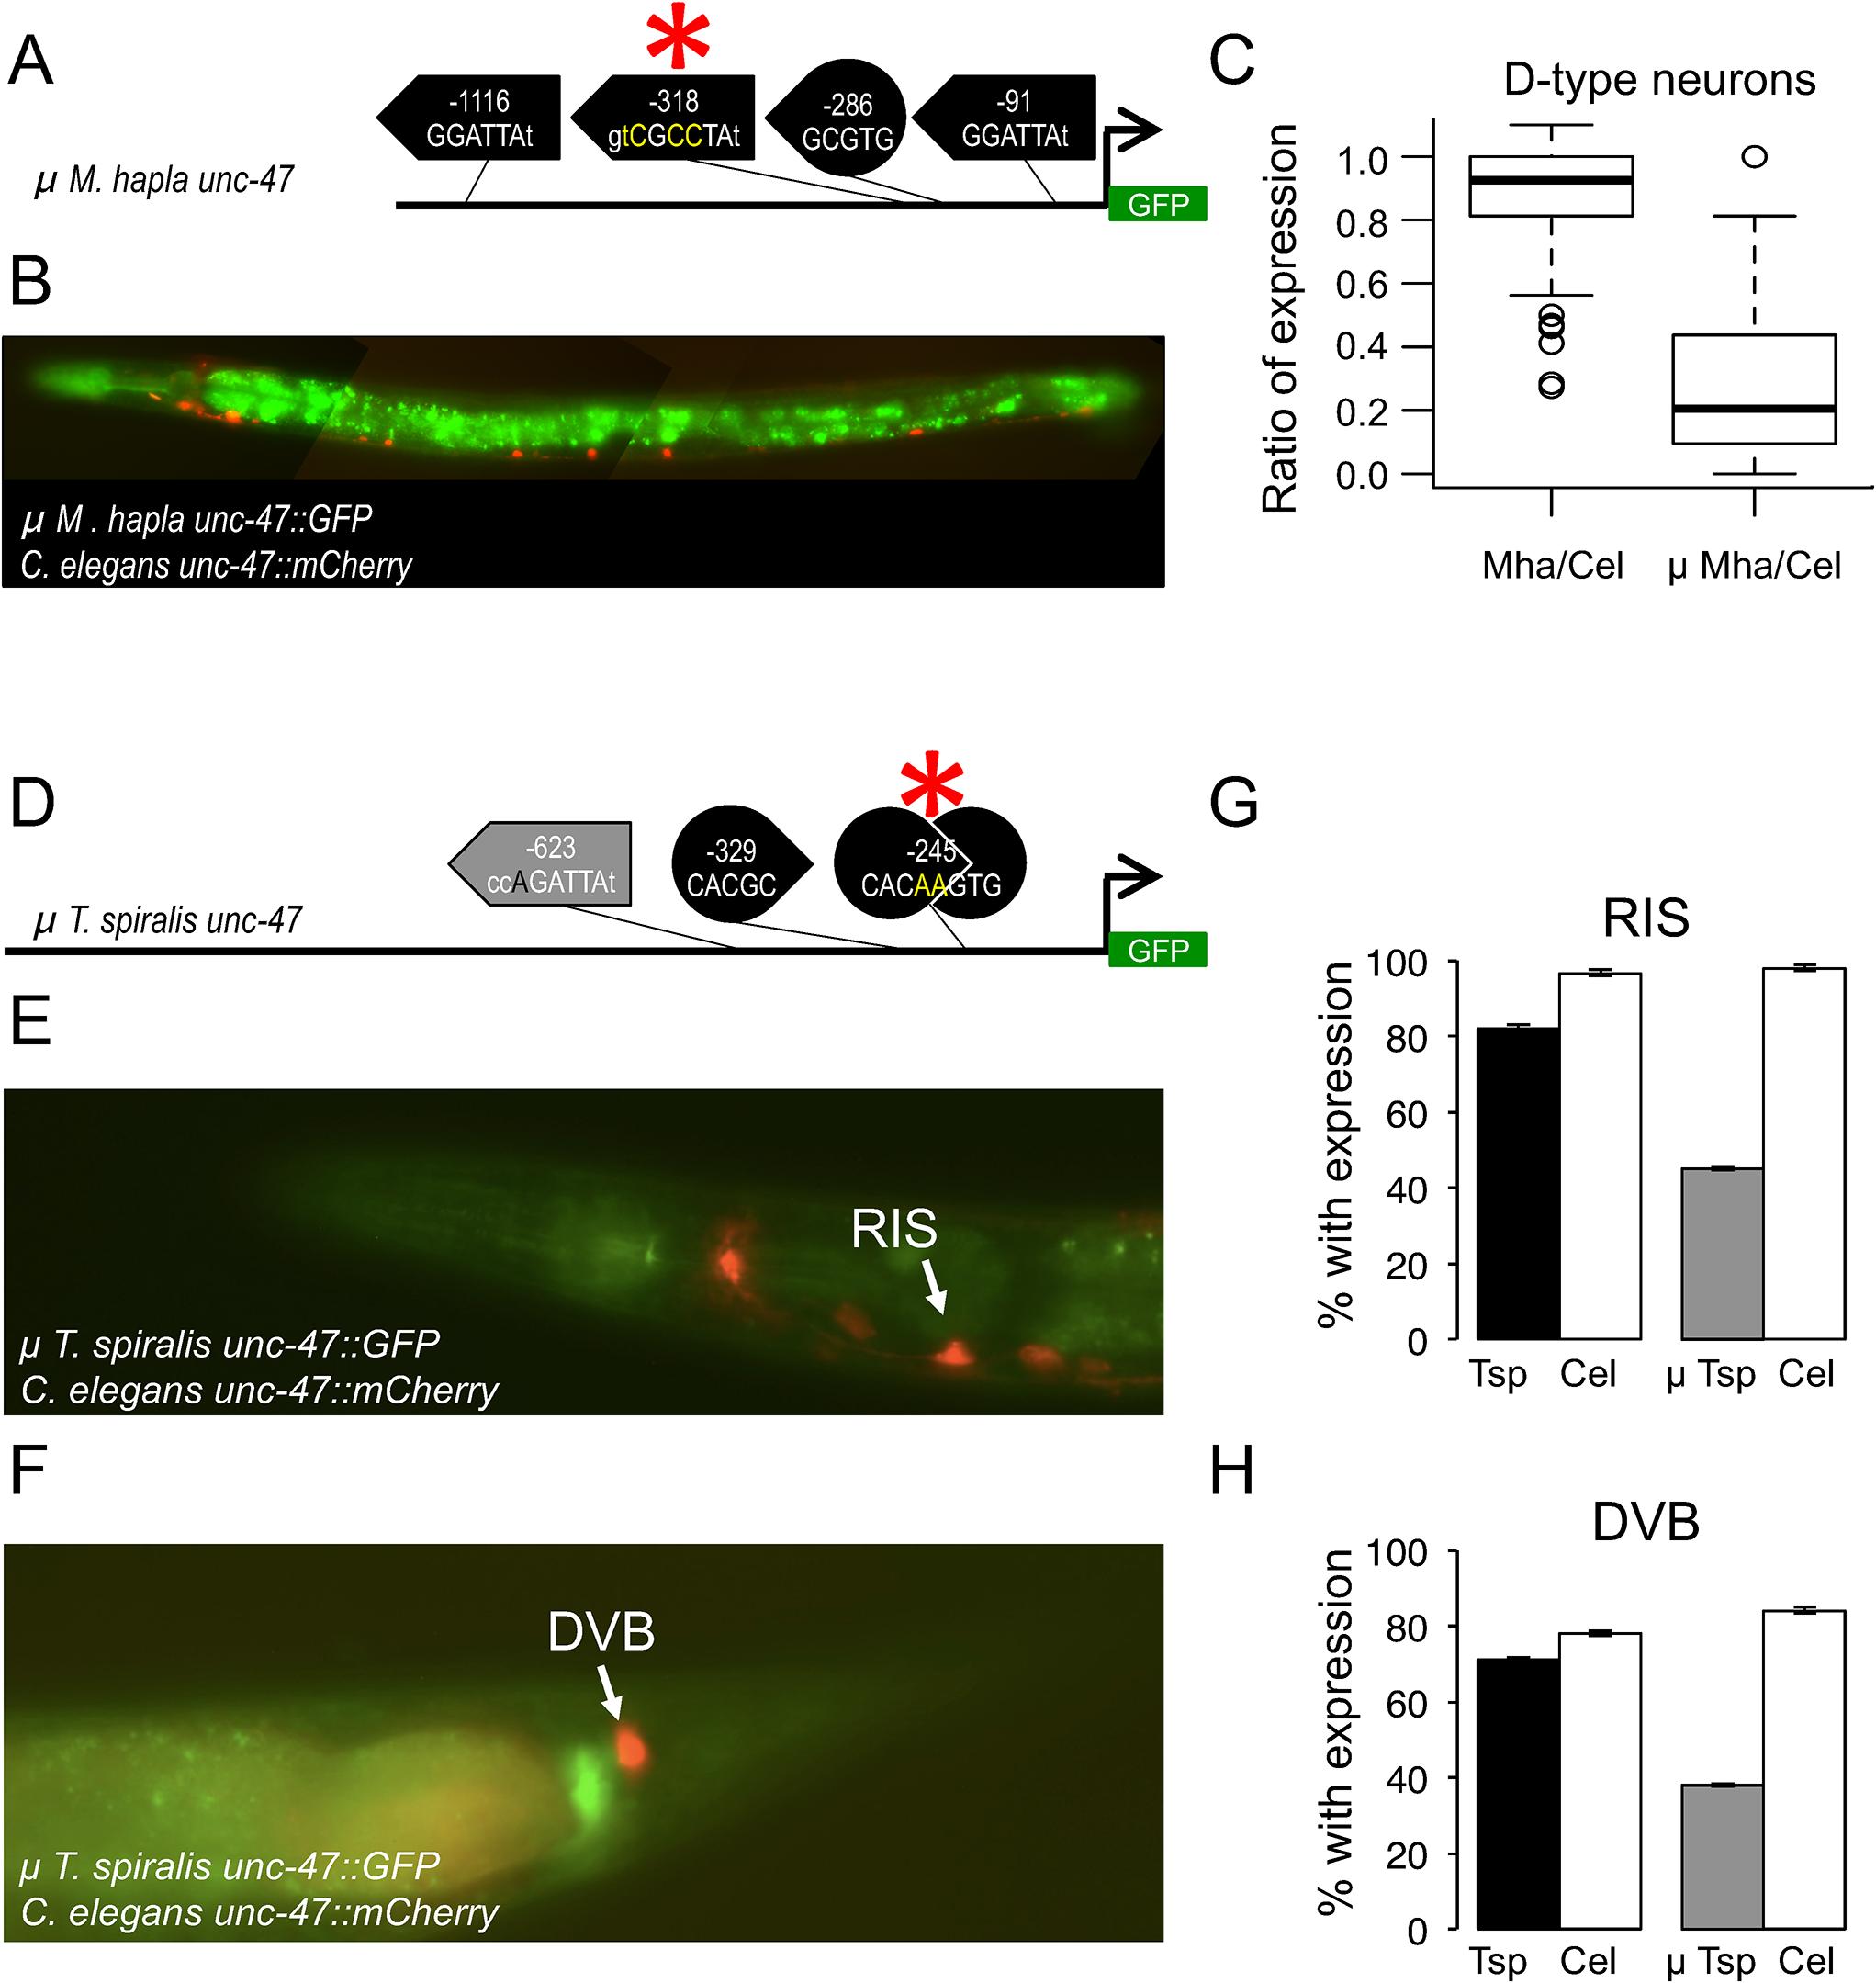 Mutations in putative transcription factor binding sites disrupt <i>cis</i>-regulatory functions.